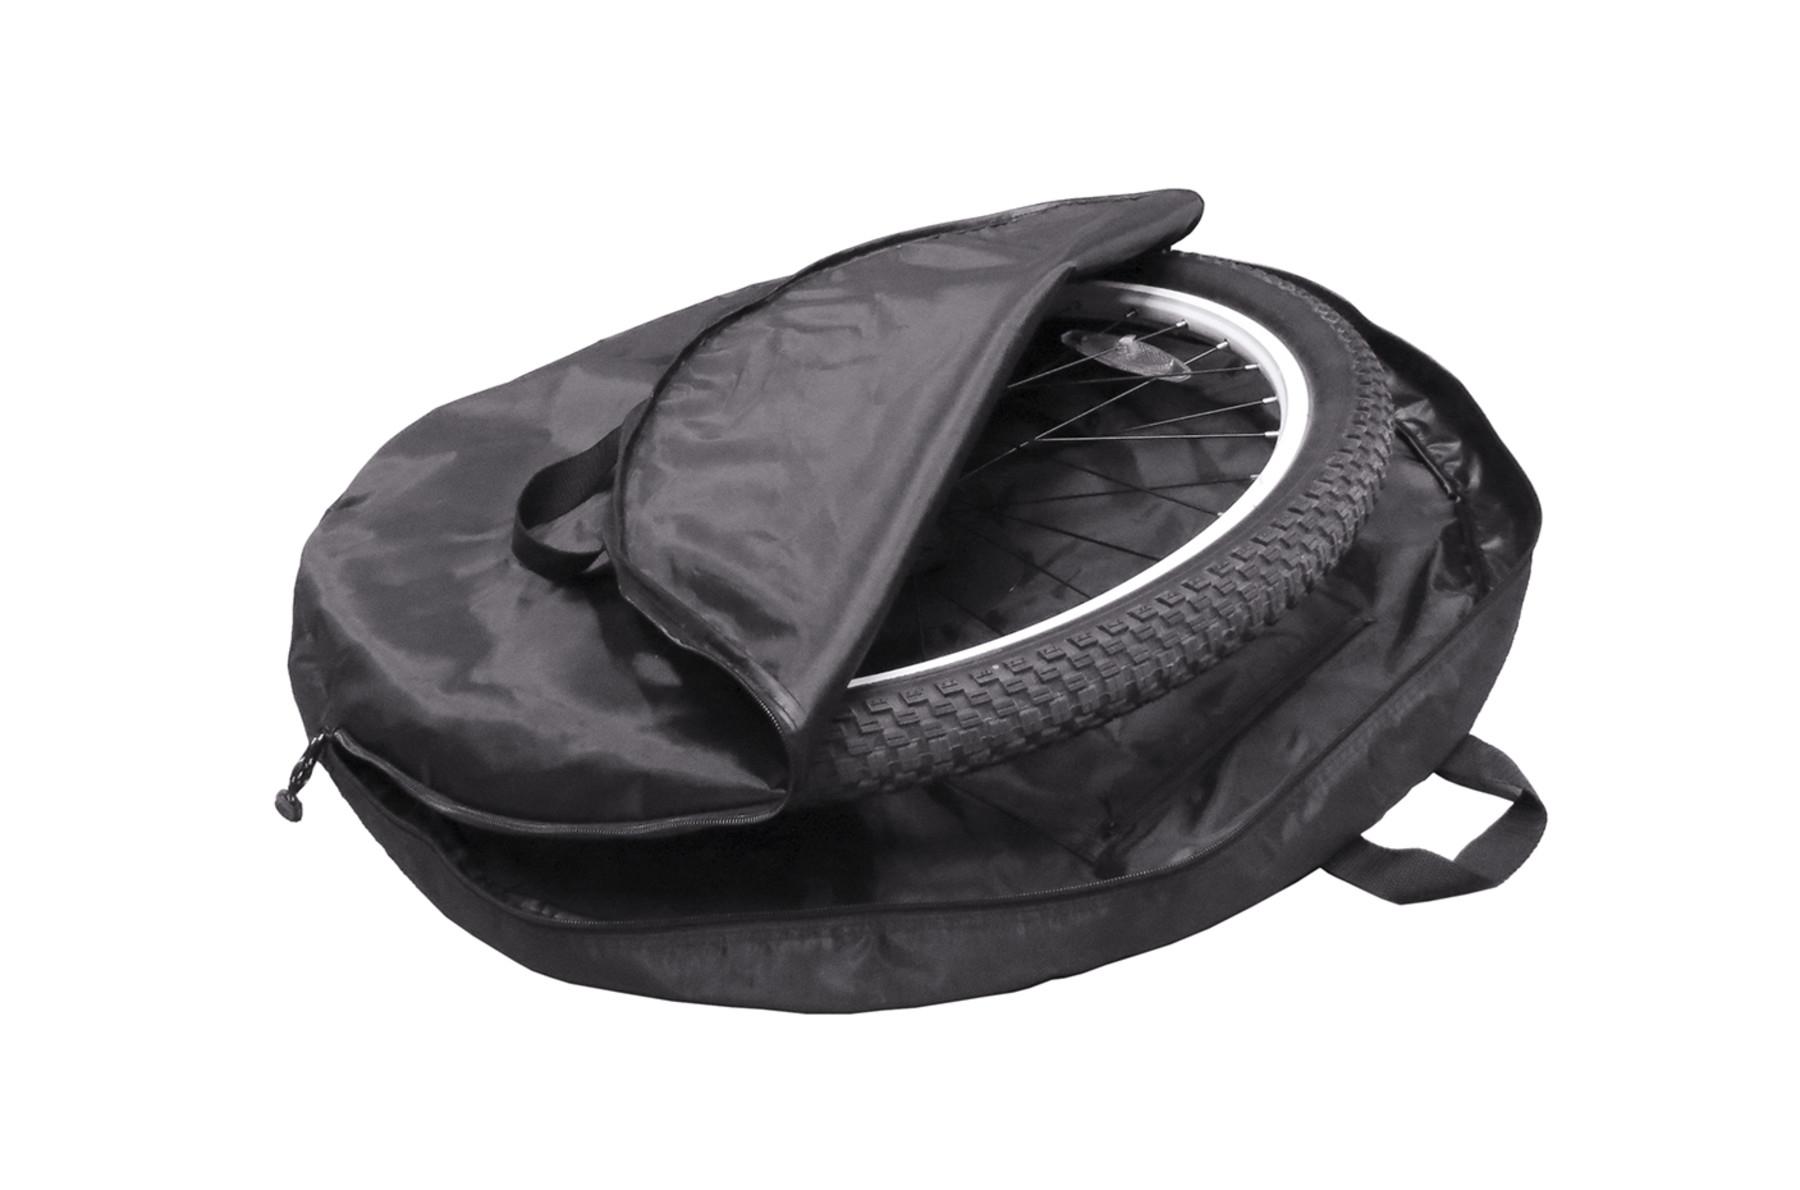 Thule Wheel Bag XL 563